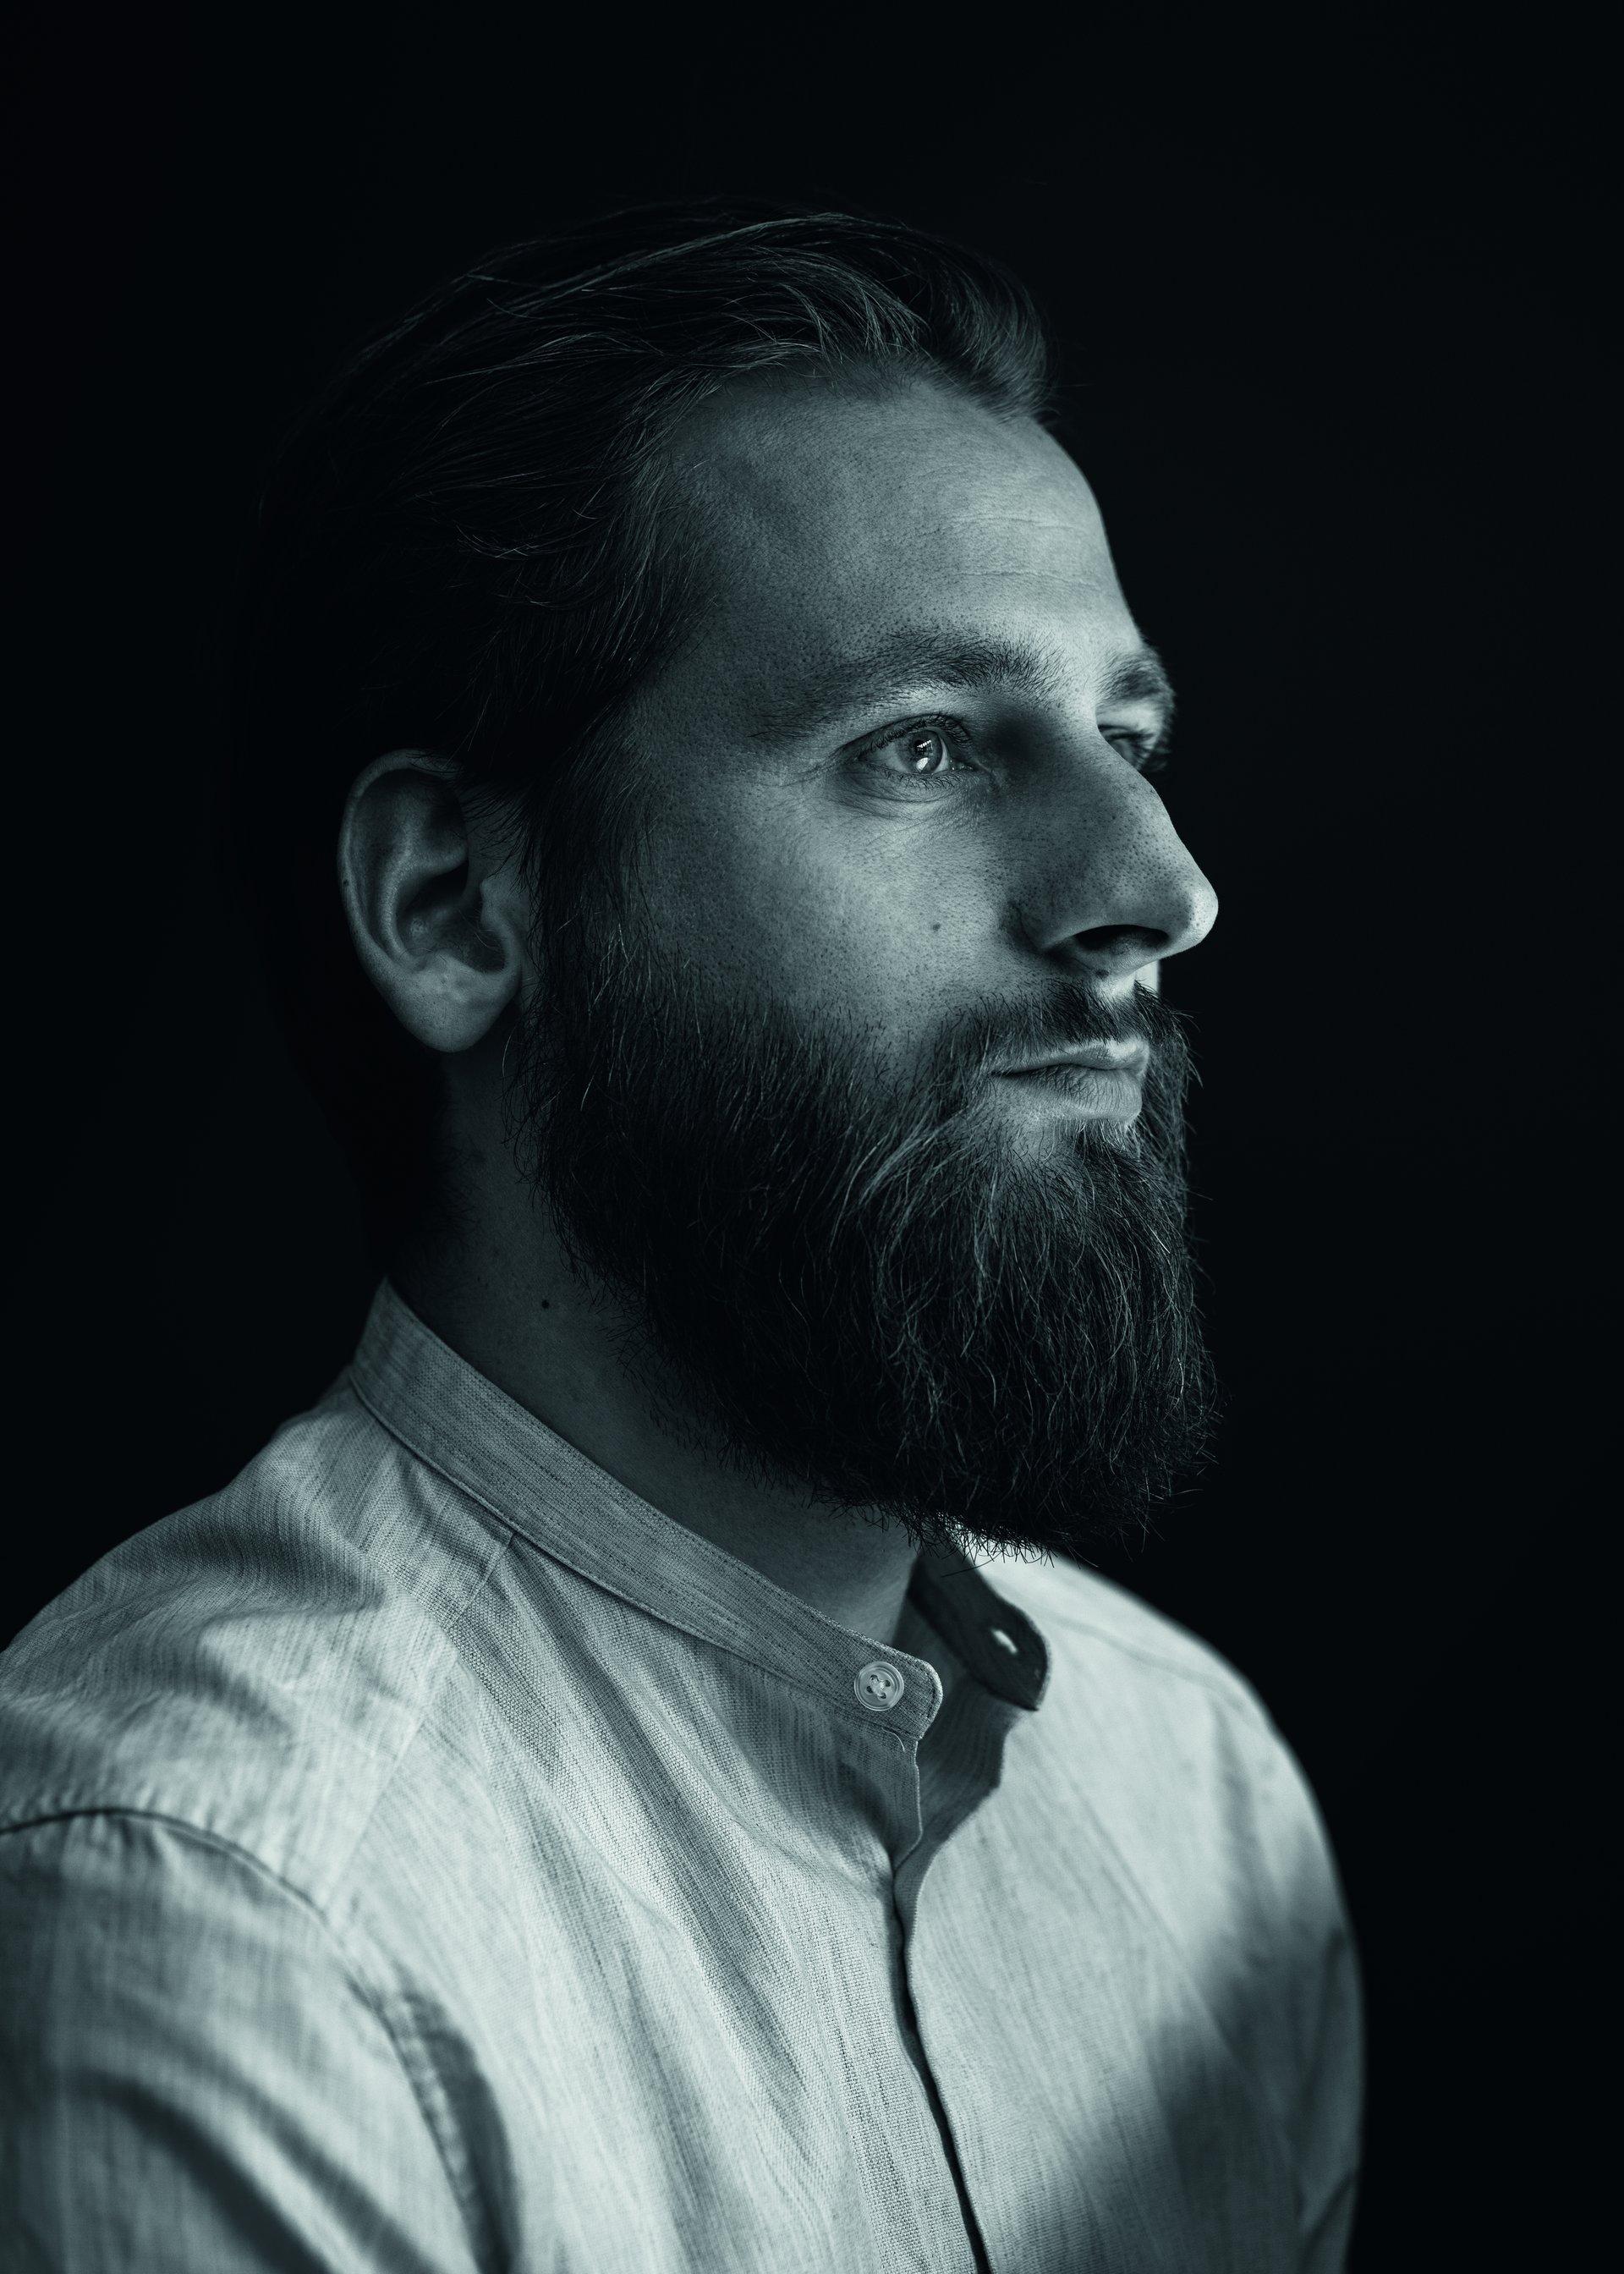 Oris's Senior Product Design Engineer Lukas Bühlmann